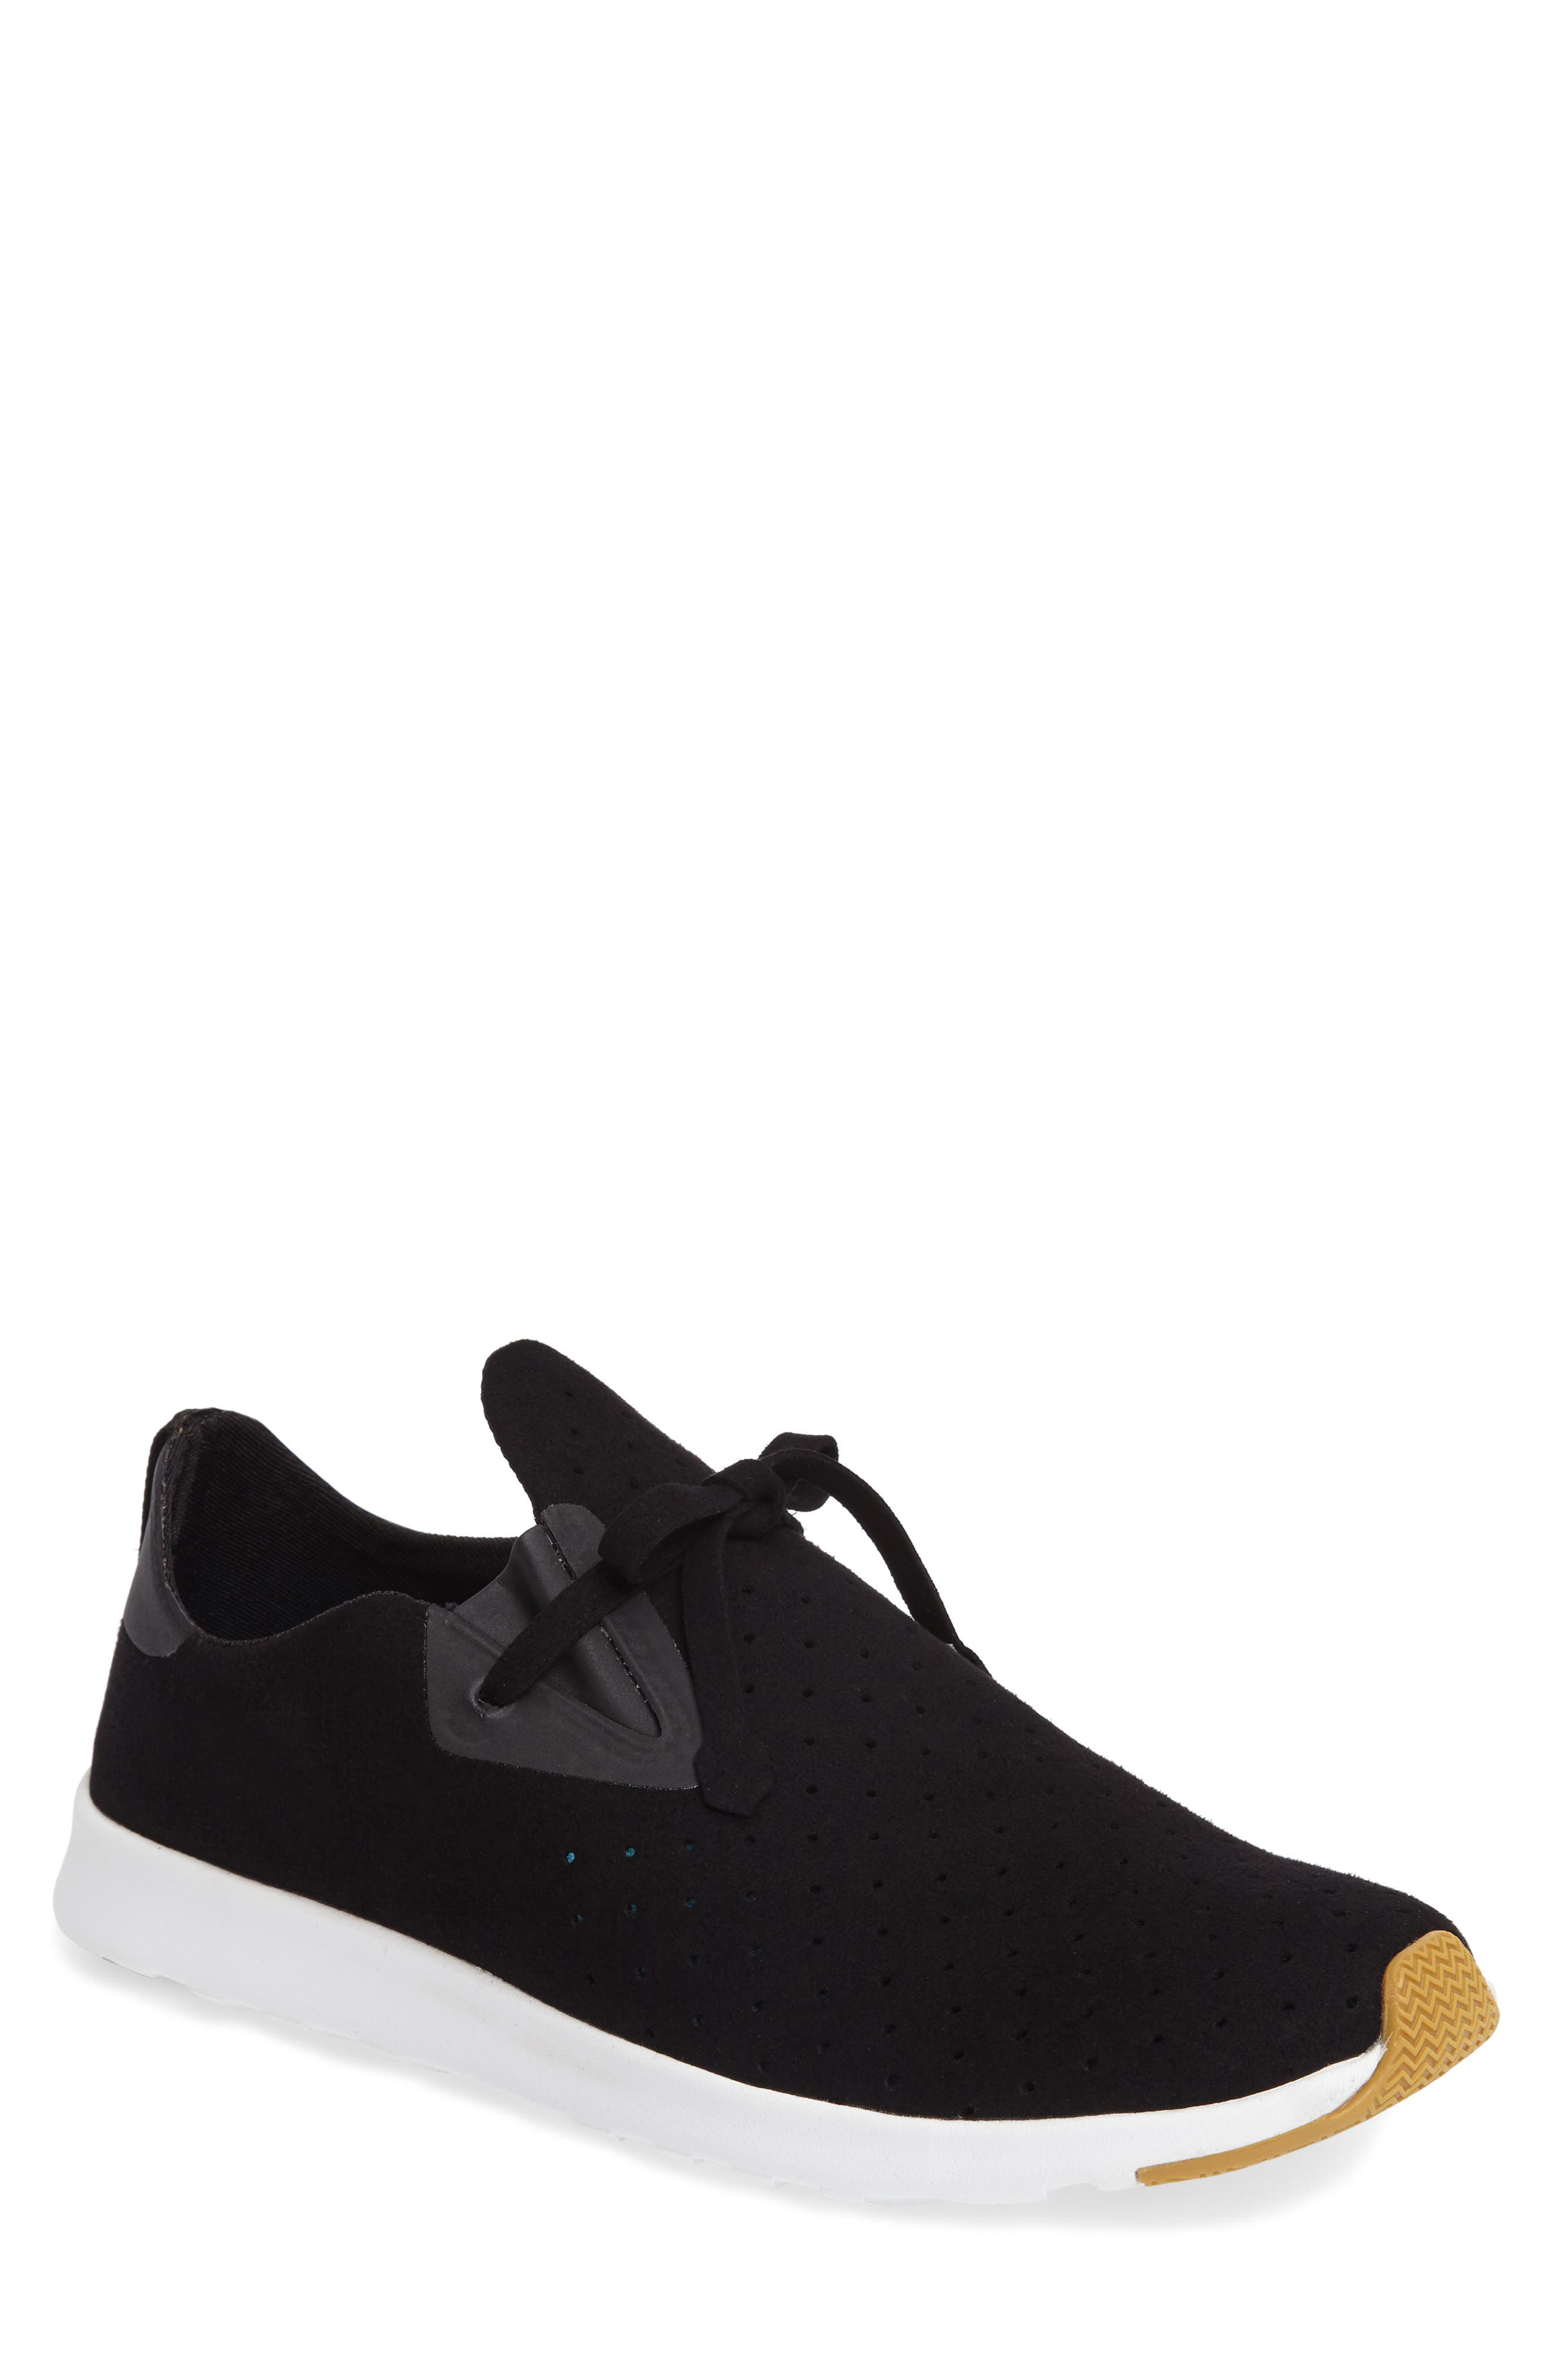 Alternate Image 1 Selected - Native Shoes 'Apollo' Sneaker (Men)